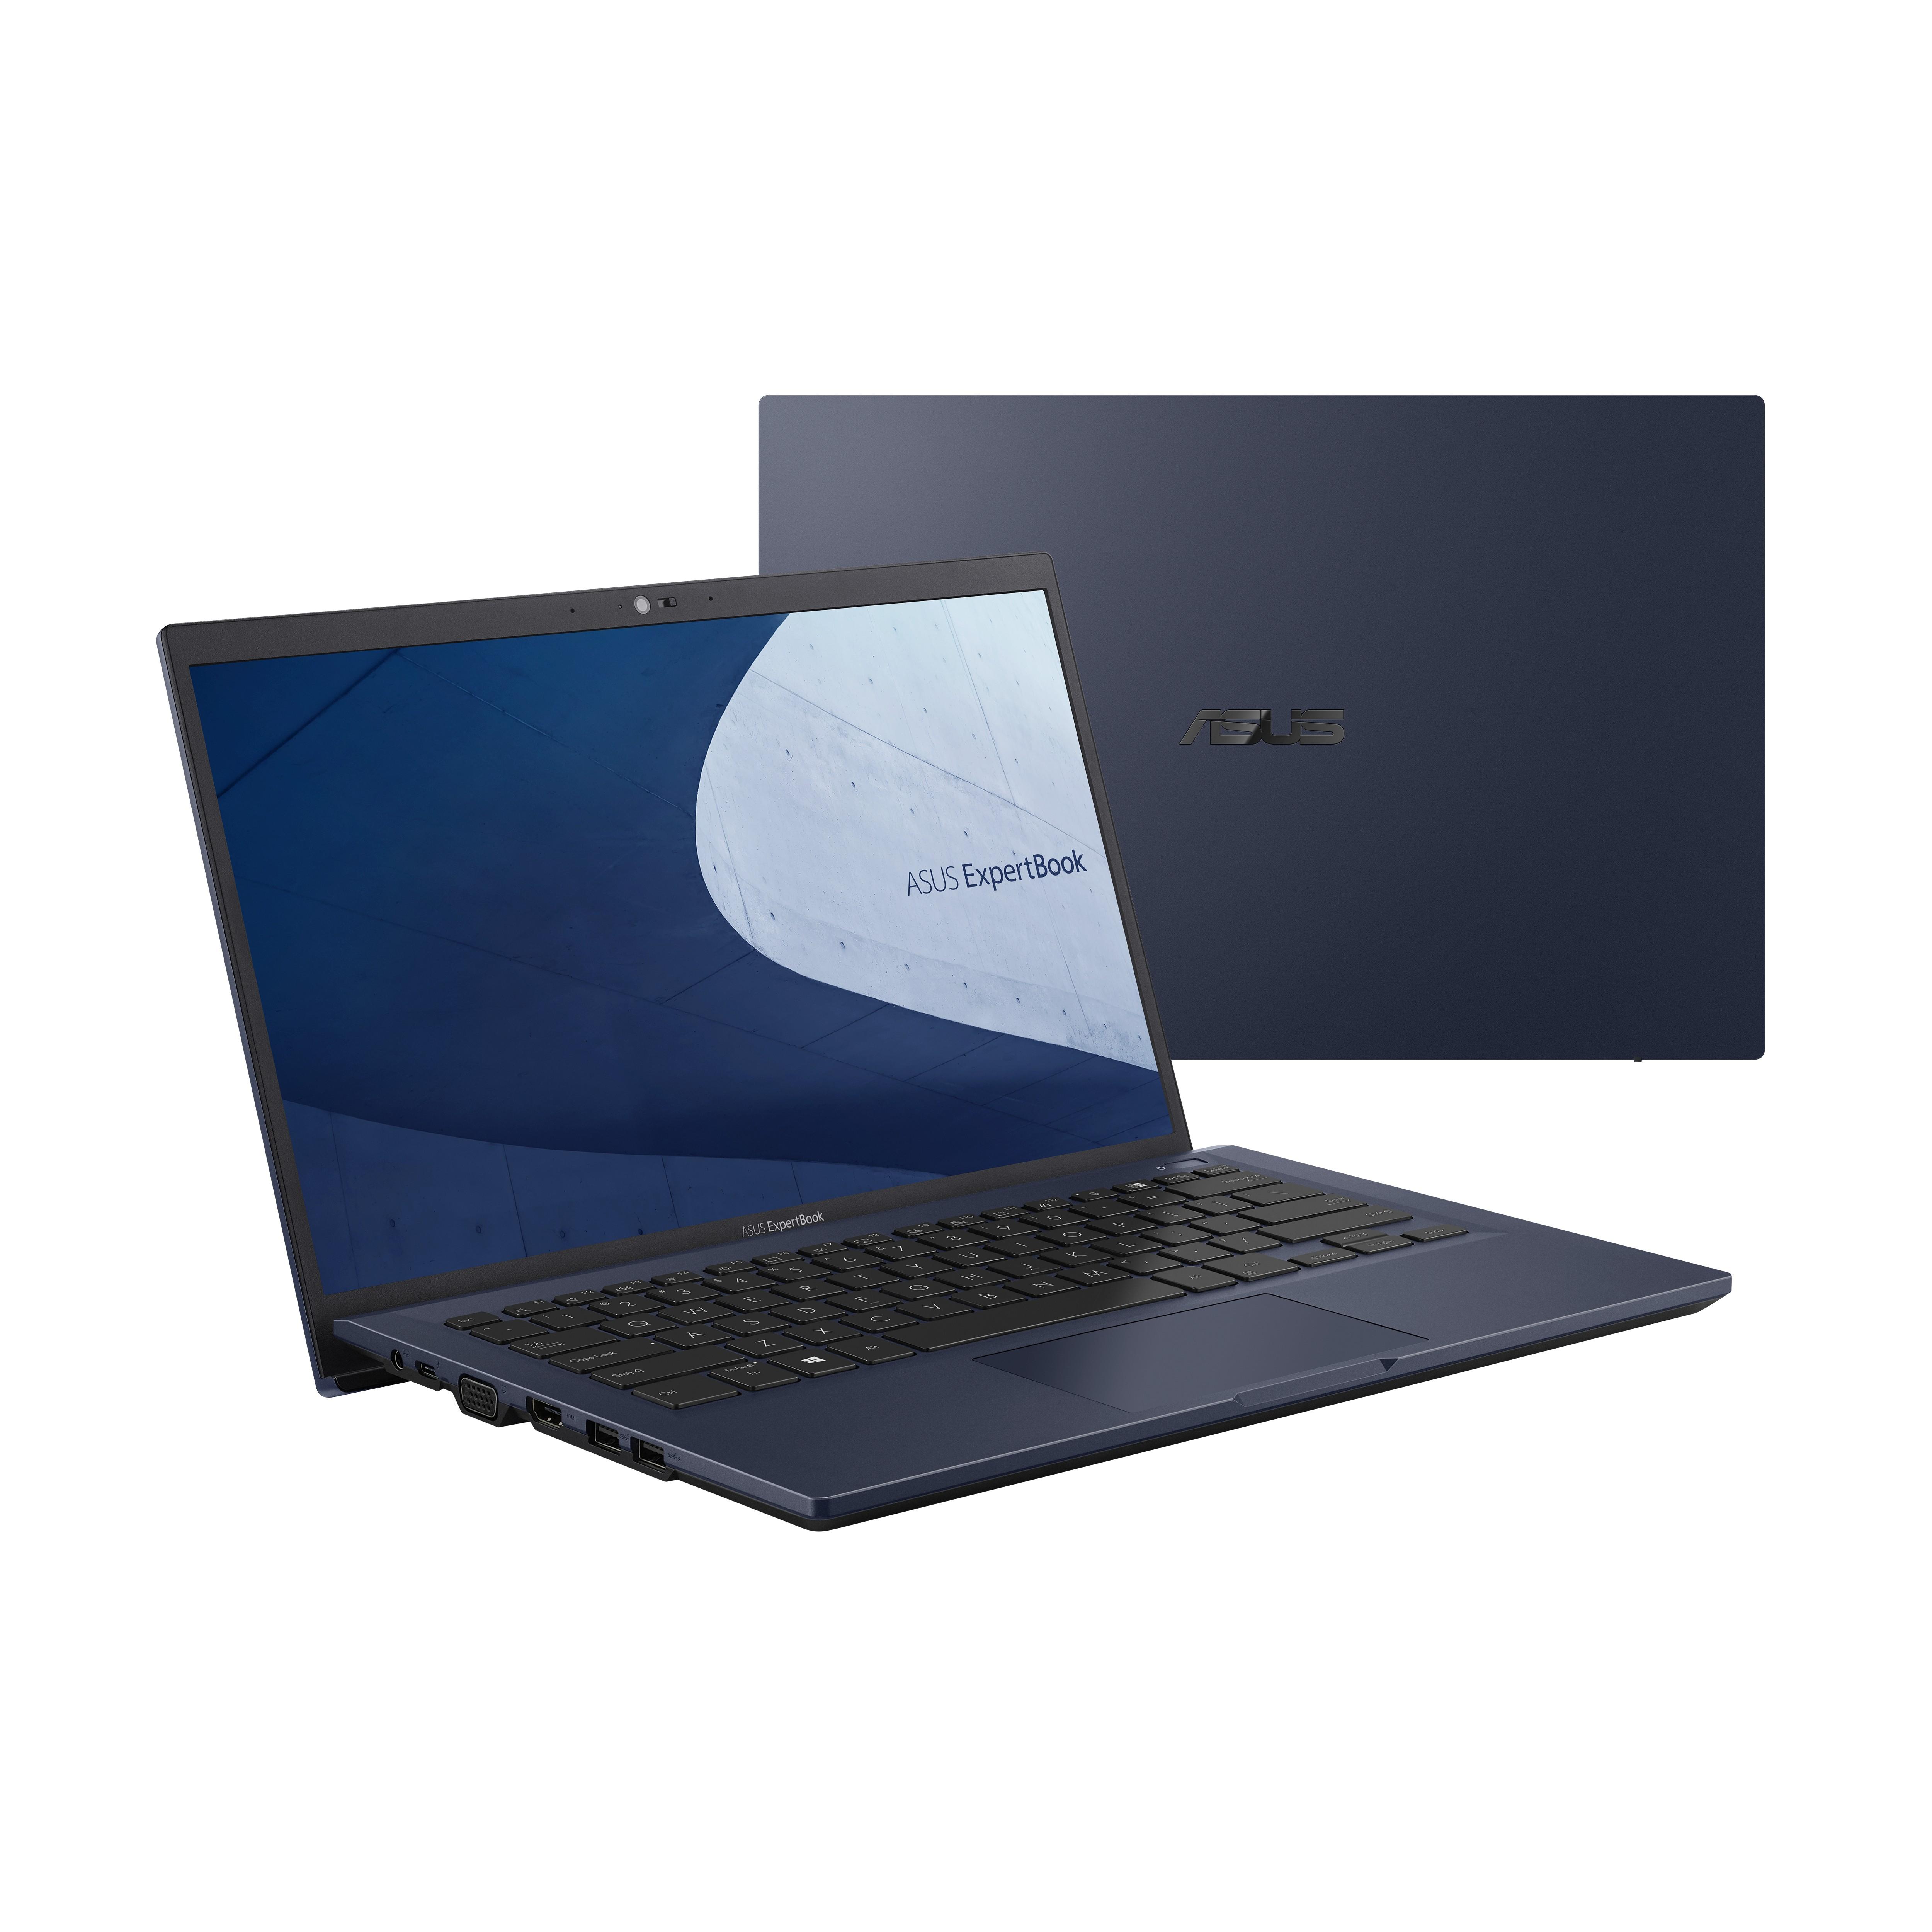 "ASUS ExpertBook B1 B1400CEAE-EK0259R Notebook 35,6 cm (14"") Full HD Intel® 11de generatie Core™ i3 8 GB DDR4-SDRAM 256 GB SSD Wi-Fi 6 (802.11ax) Windows 10 Pro Zwart"